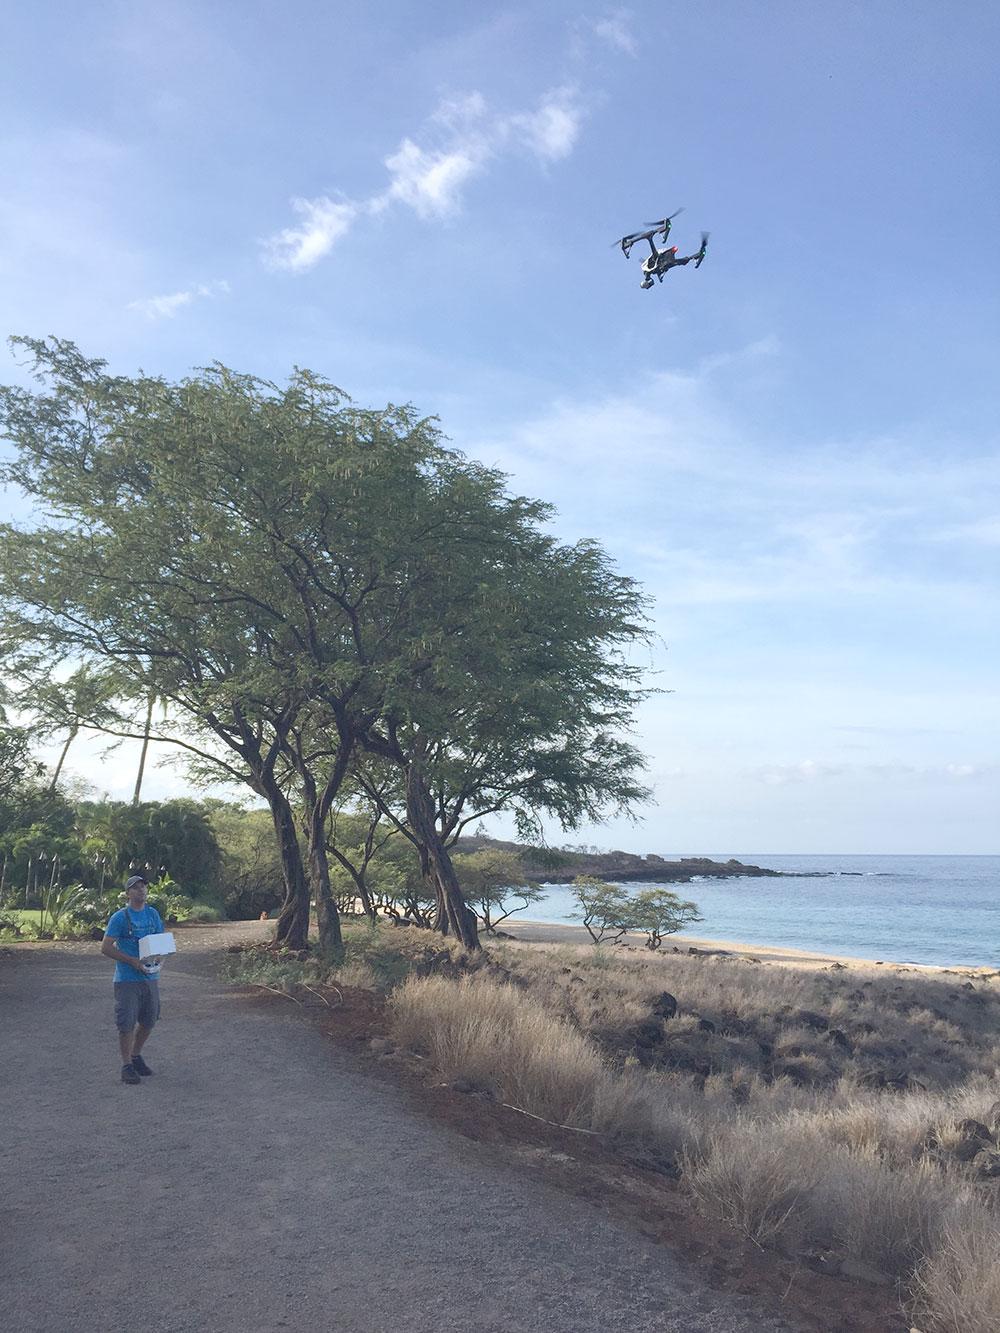 ian_and_drone-Lanai_edited.jpg